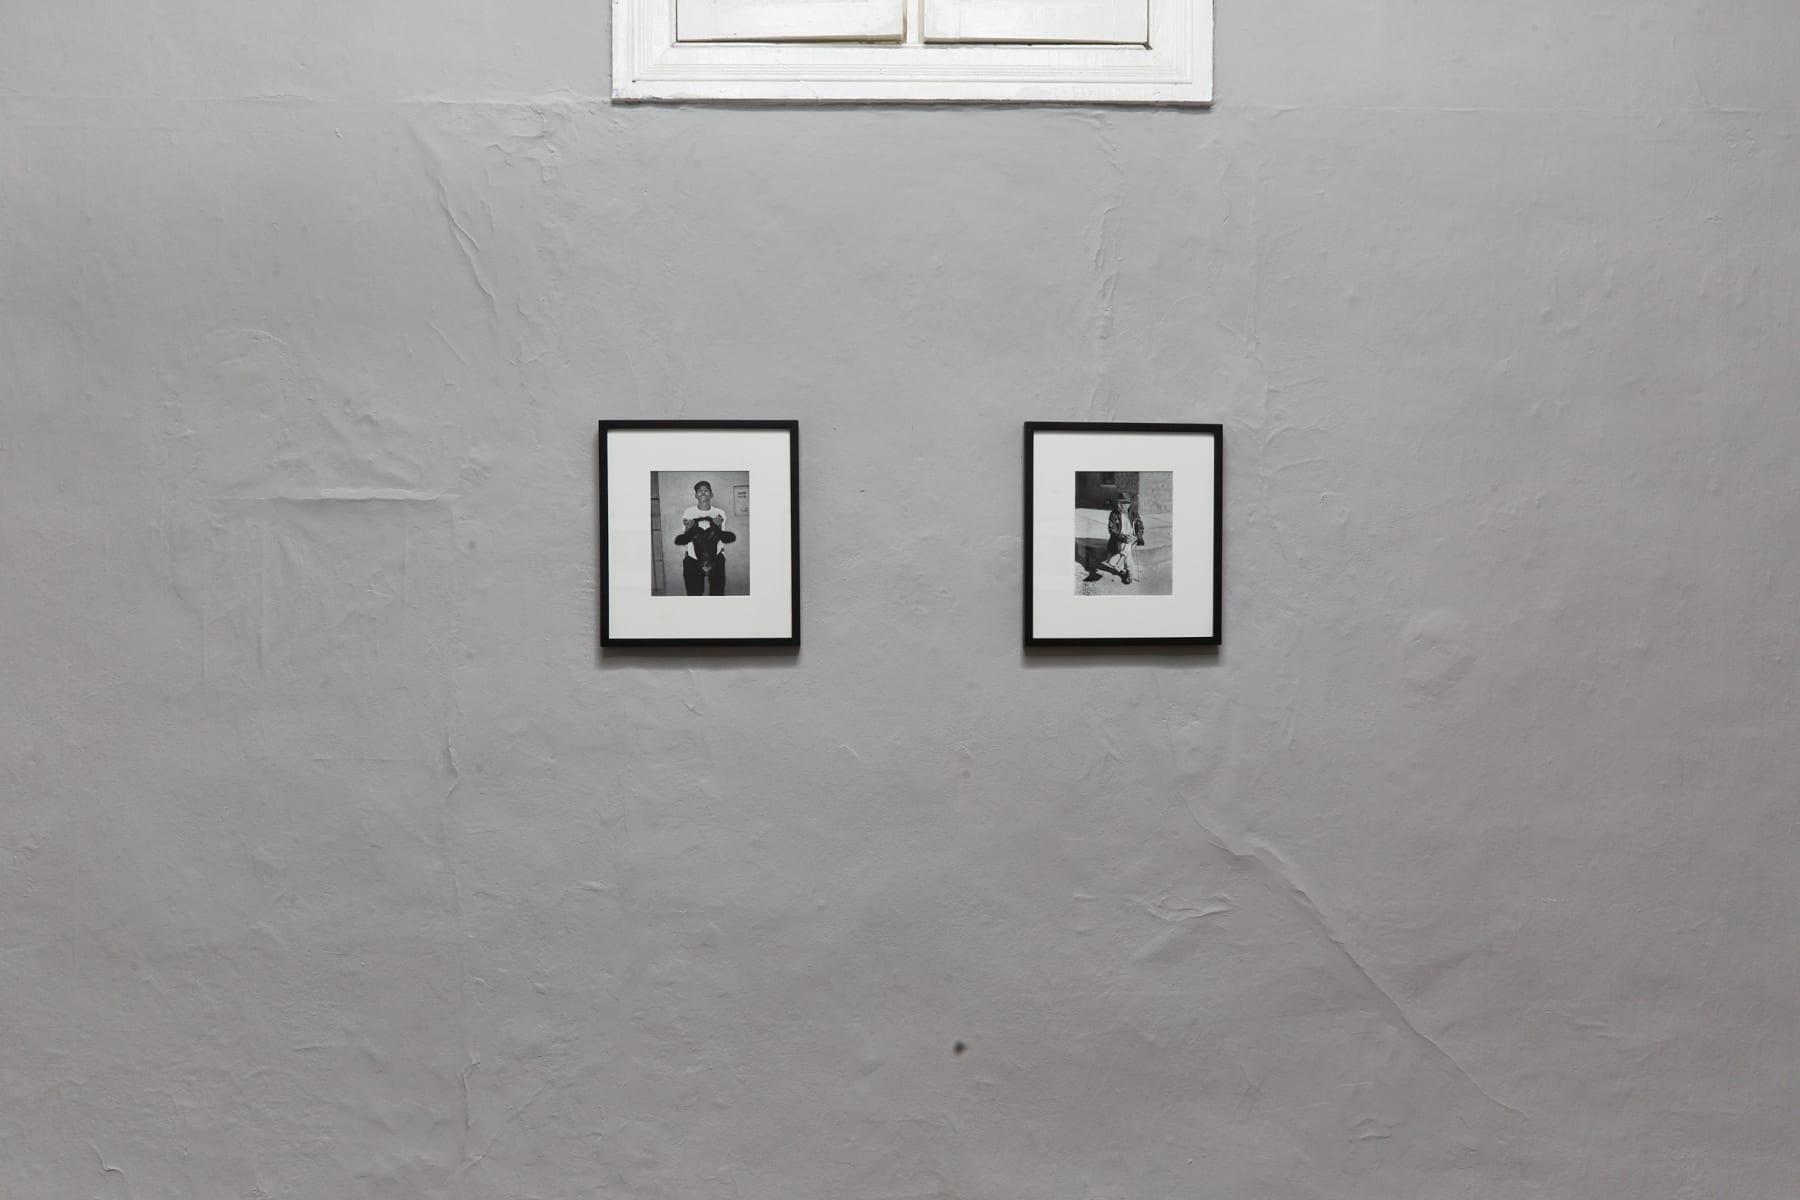 Sebastián Montalvo Gray, Portraits: Cajamala, 2020 Installation view